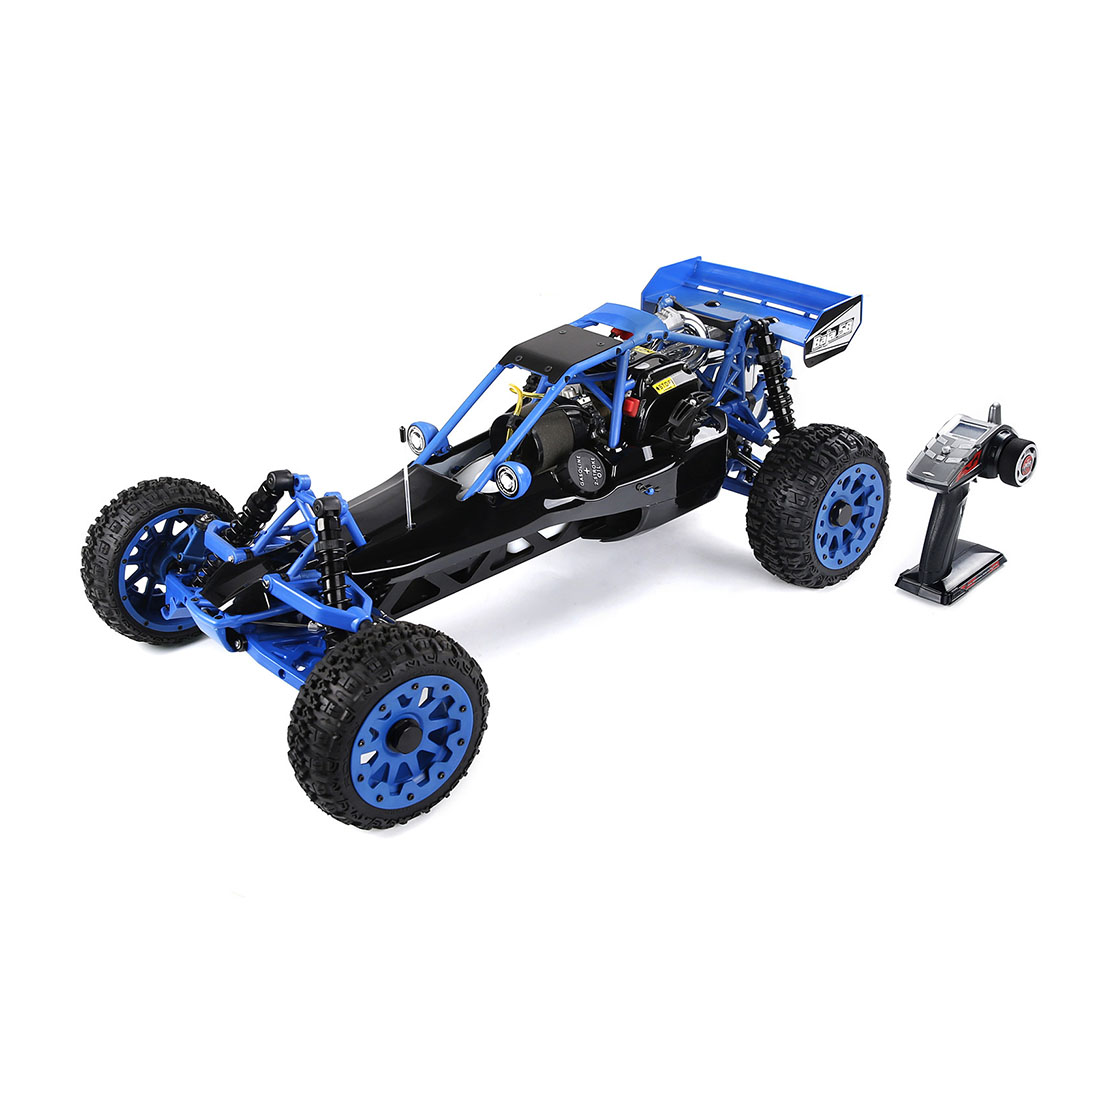 1:5 BAHA320 High Strength Nylon Gasoline Remote Control Car Off-road Vehicle Body 32cc Gasoline Engine 2.4G Remote Control RTR